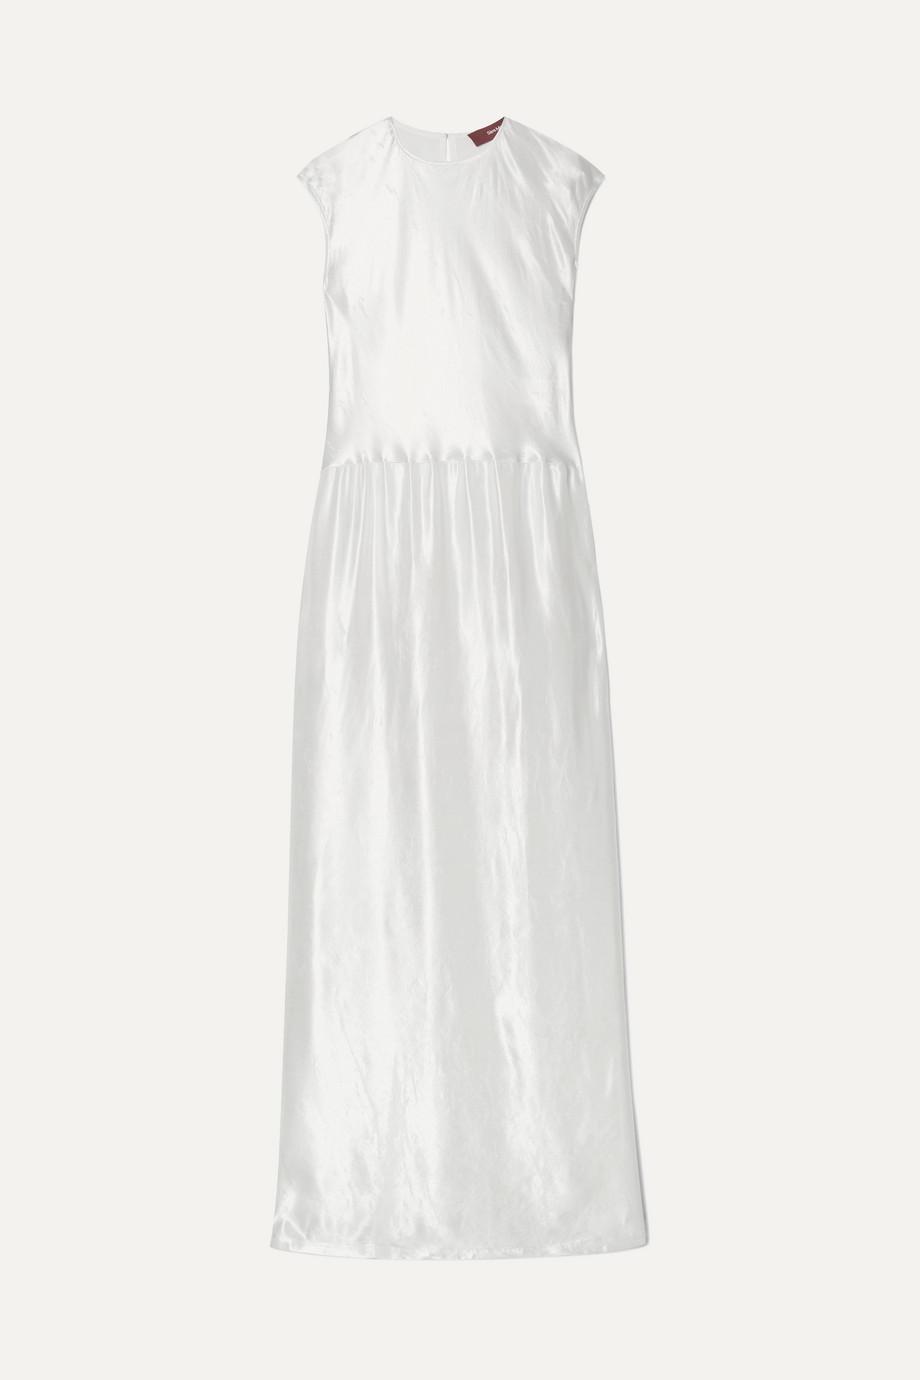 Sies Marjan | Winona washed-satin maxi dress | NET-A-PORTER.COM